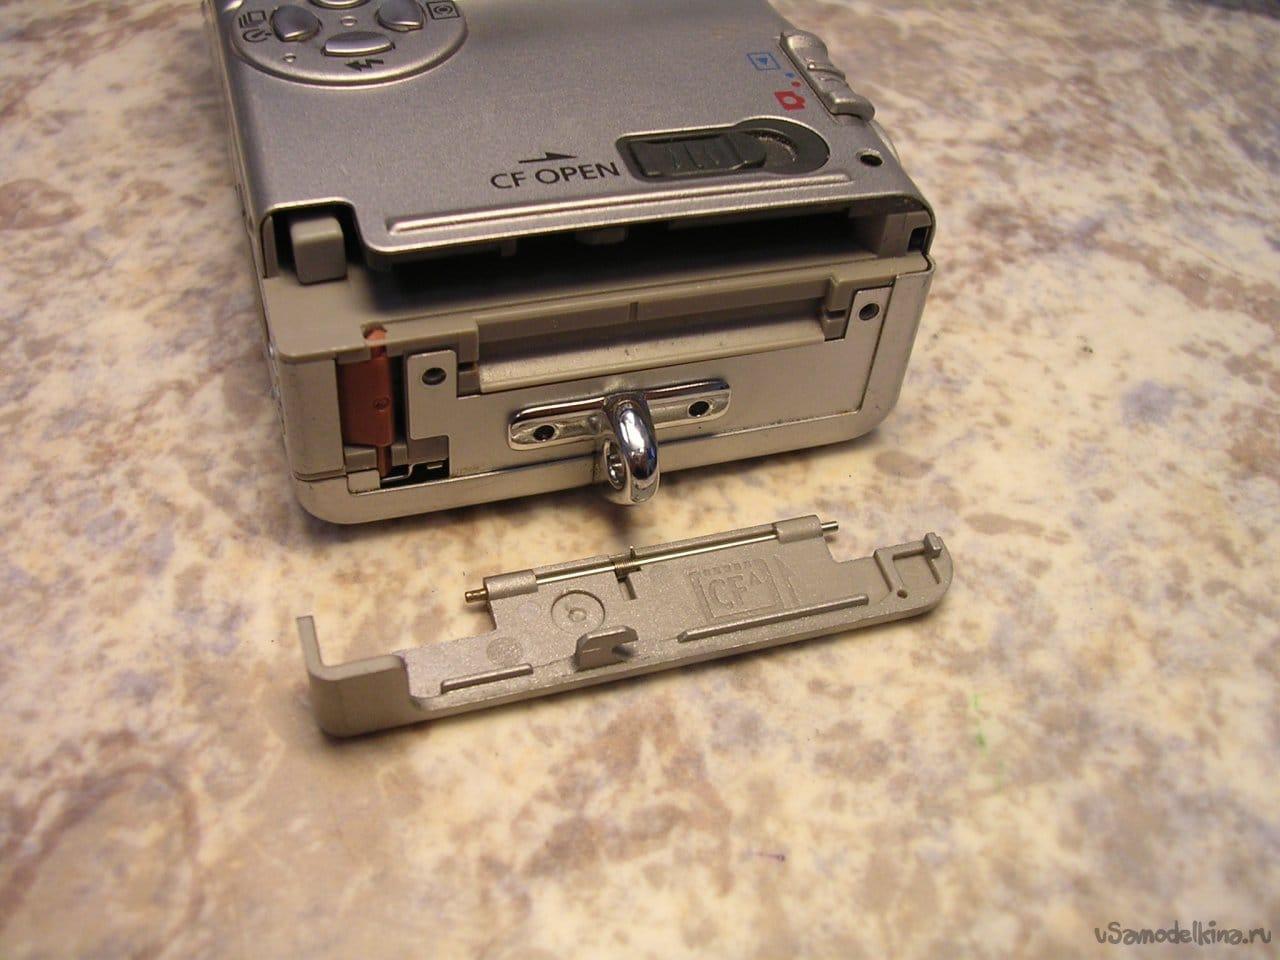 CANON IXUS 400 camera with 'growl'